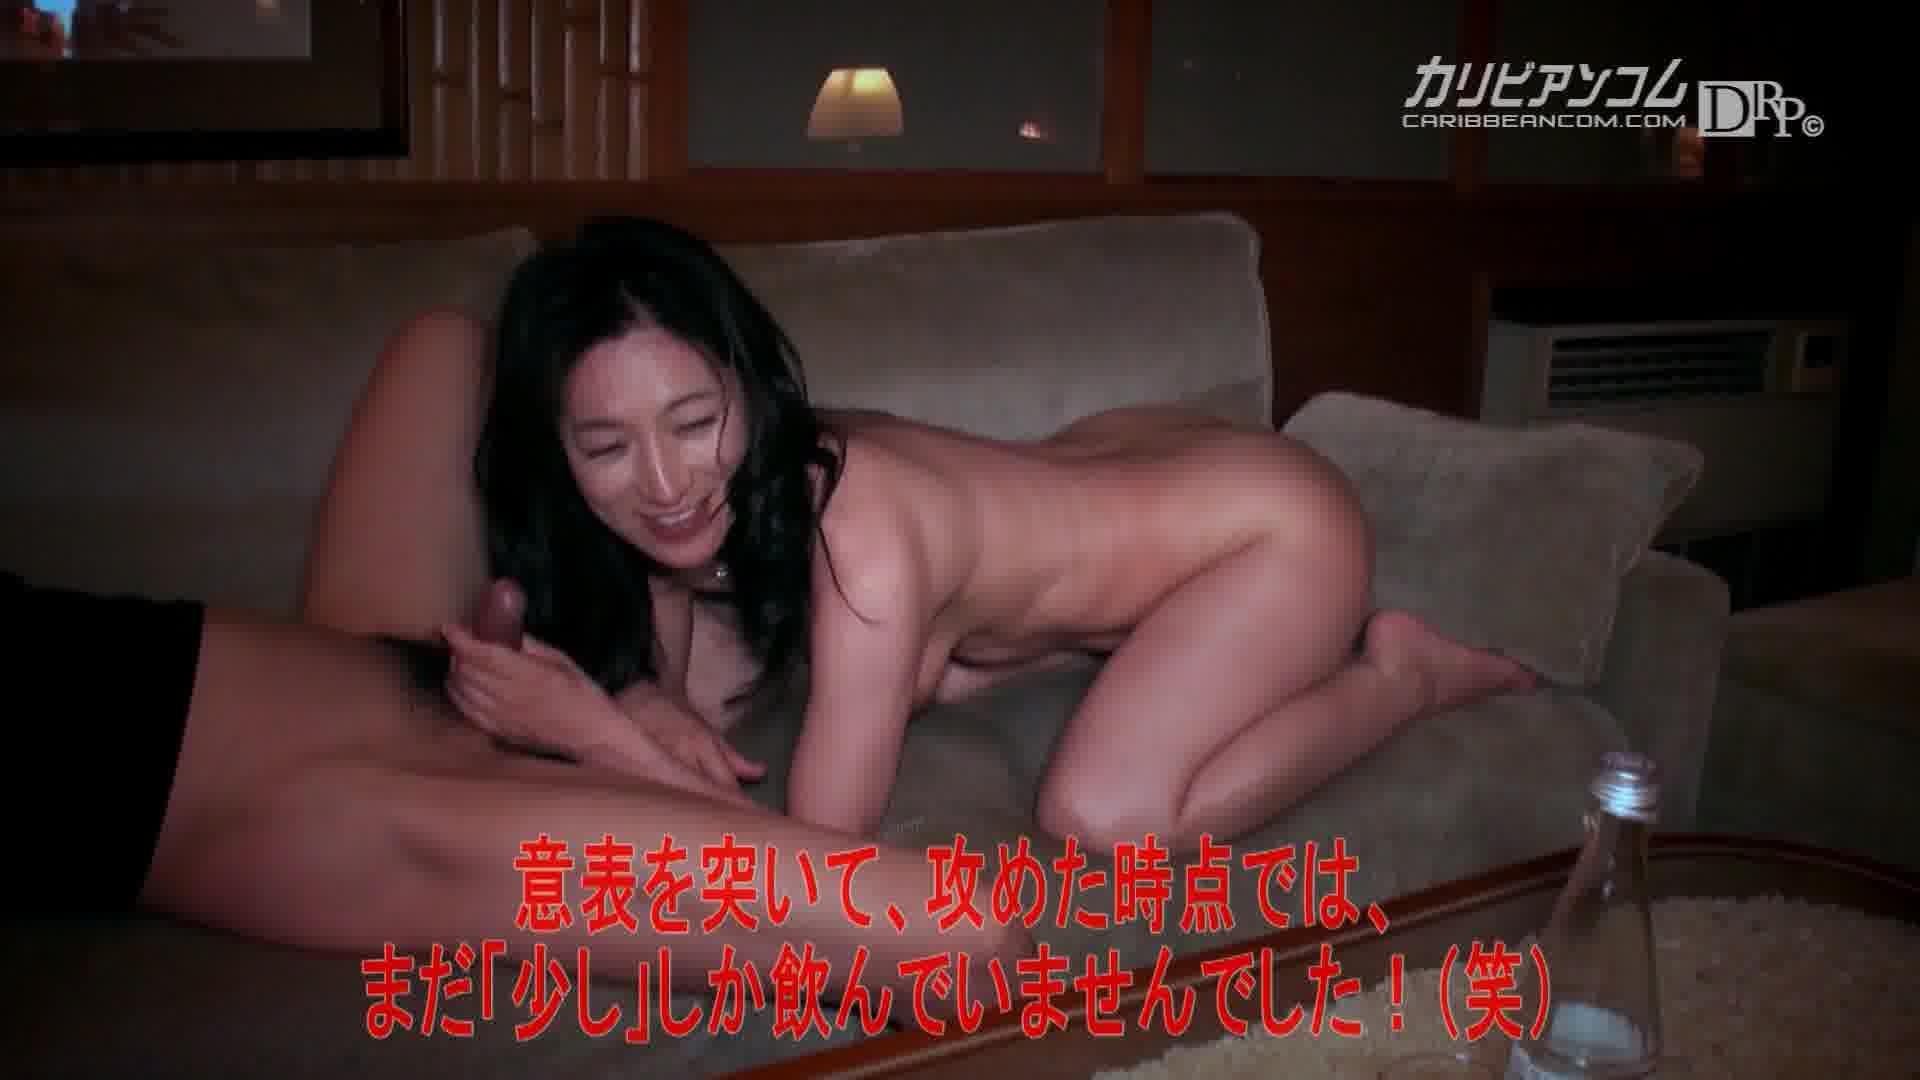 AV女優と飲み…そして泊まりSEX by HAMAR 8 前編 - 松本まりな【オナニー・スレンダー・中出し】